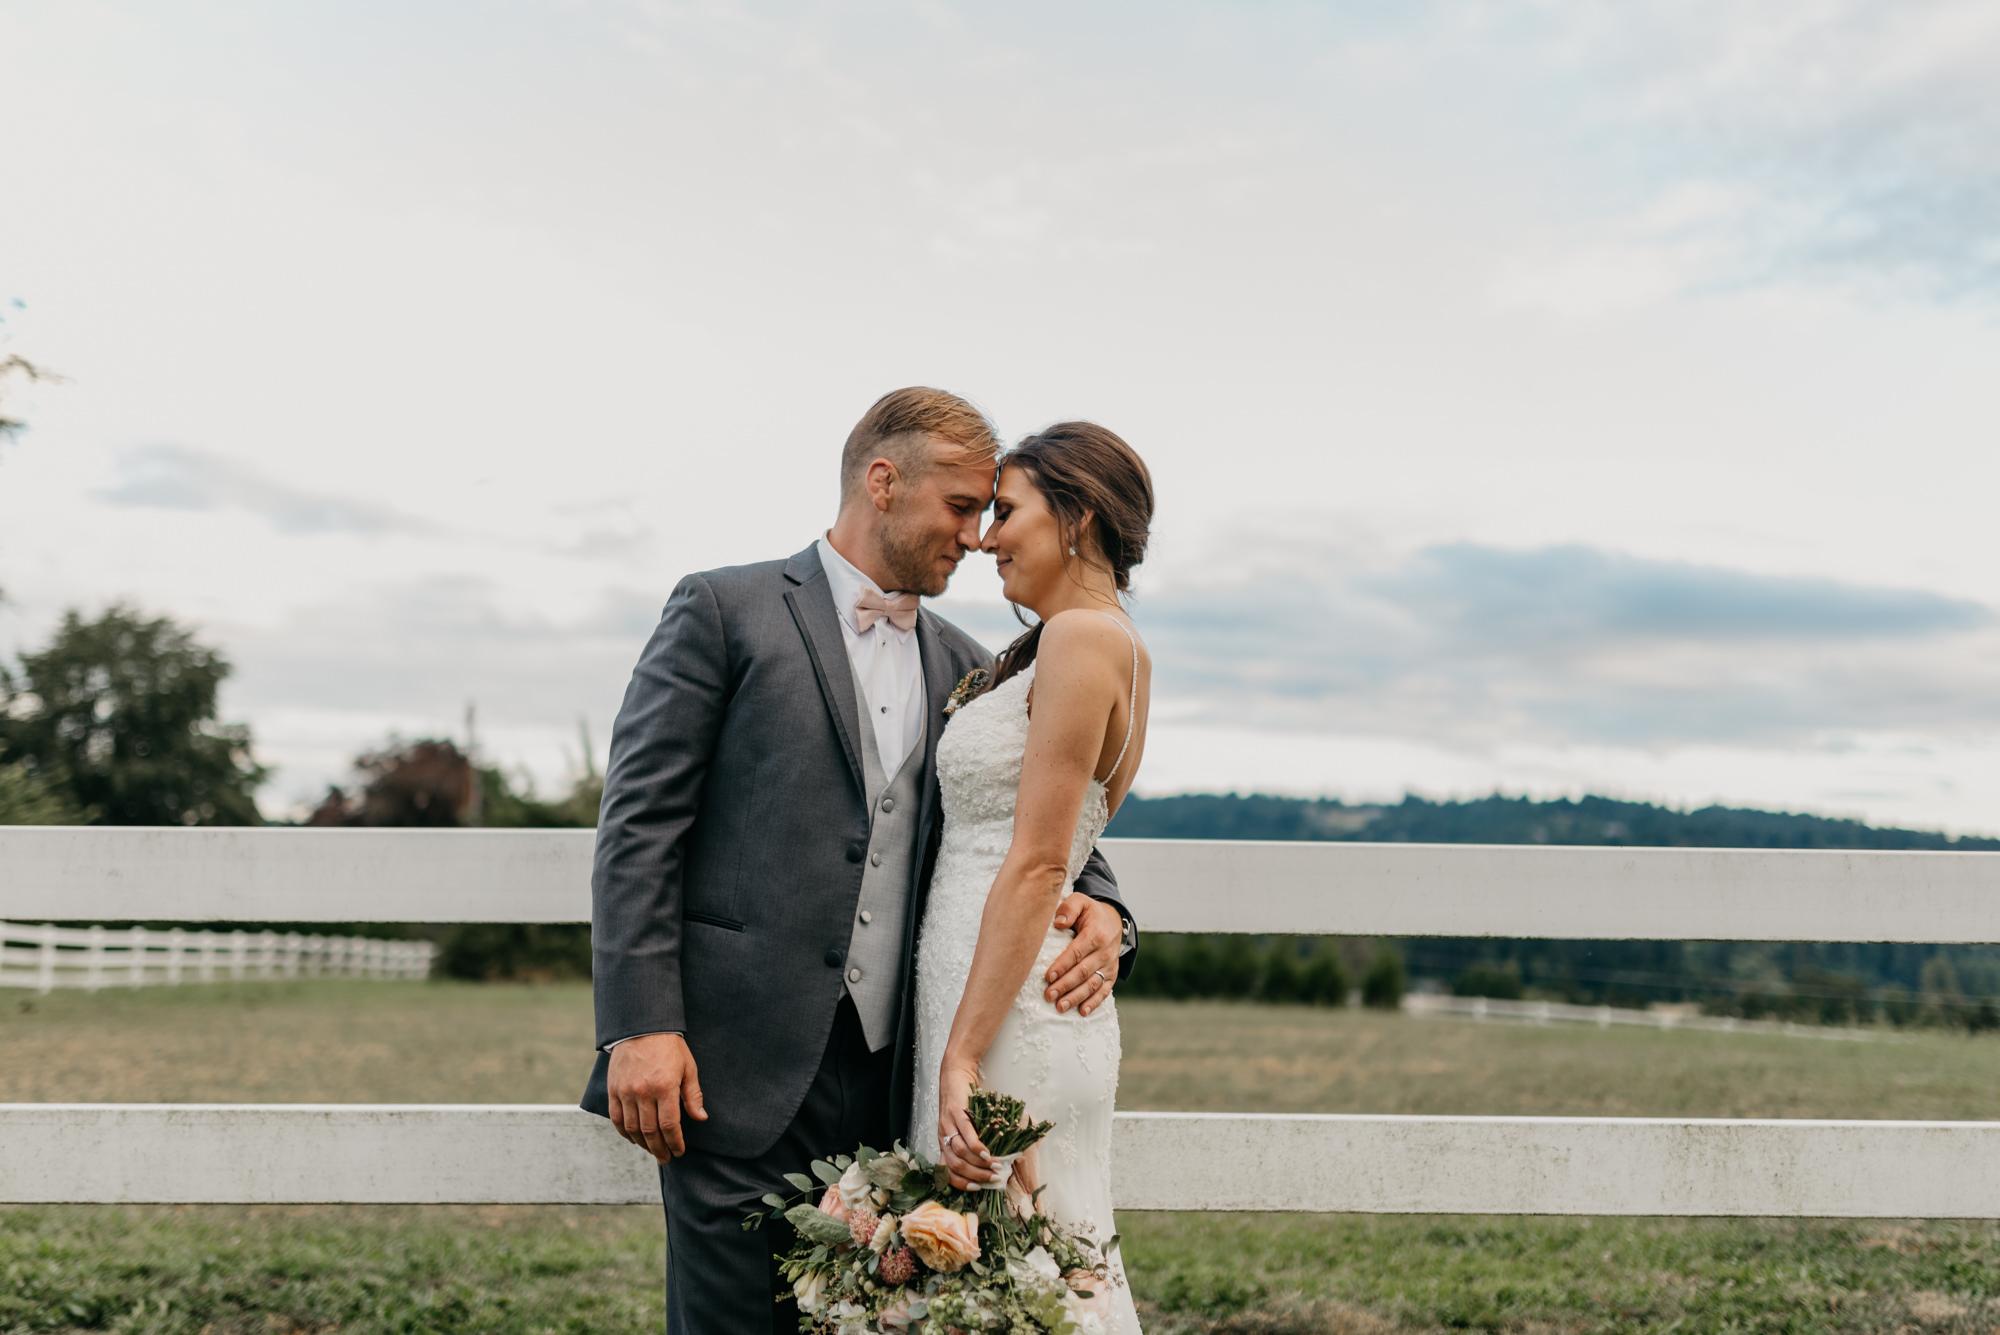 196-barn-kestrel-portland-northwest-horse-sunset-wedding.jpg